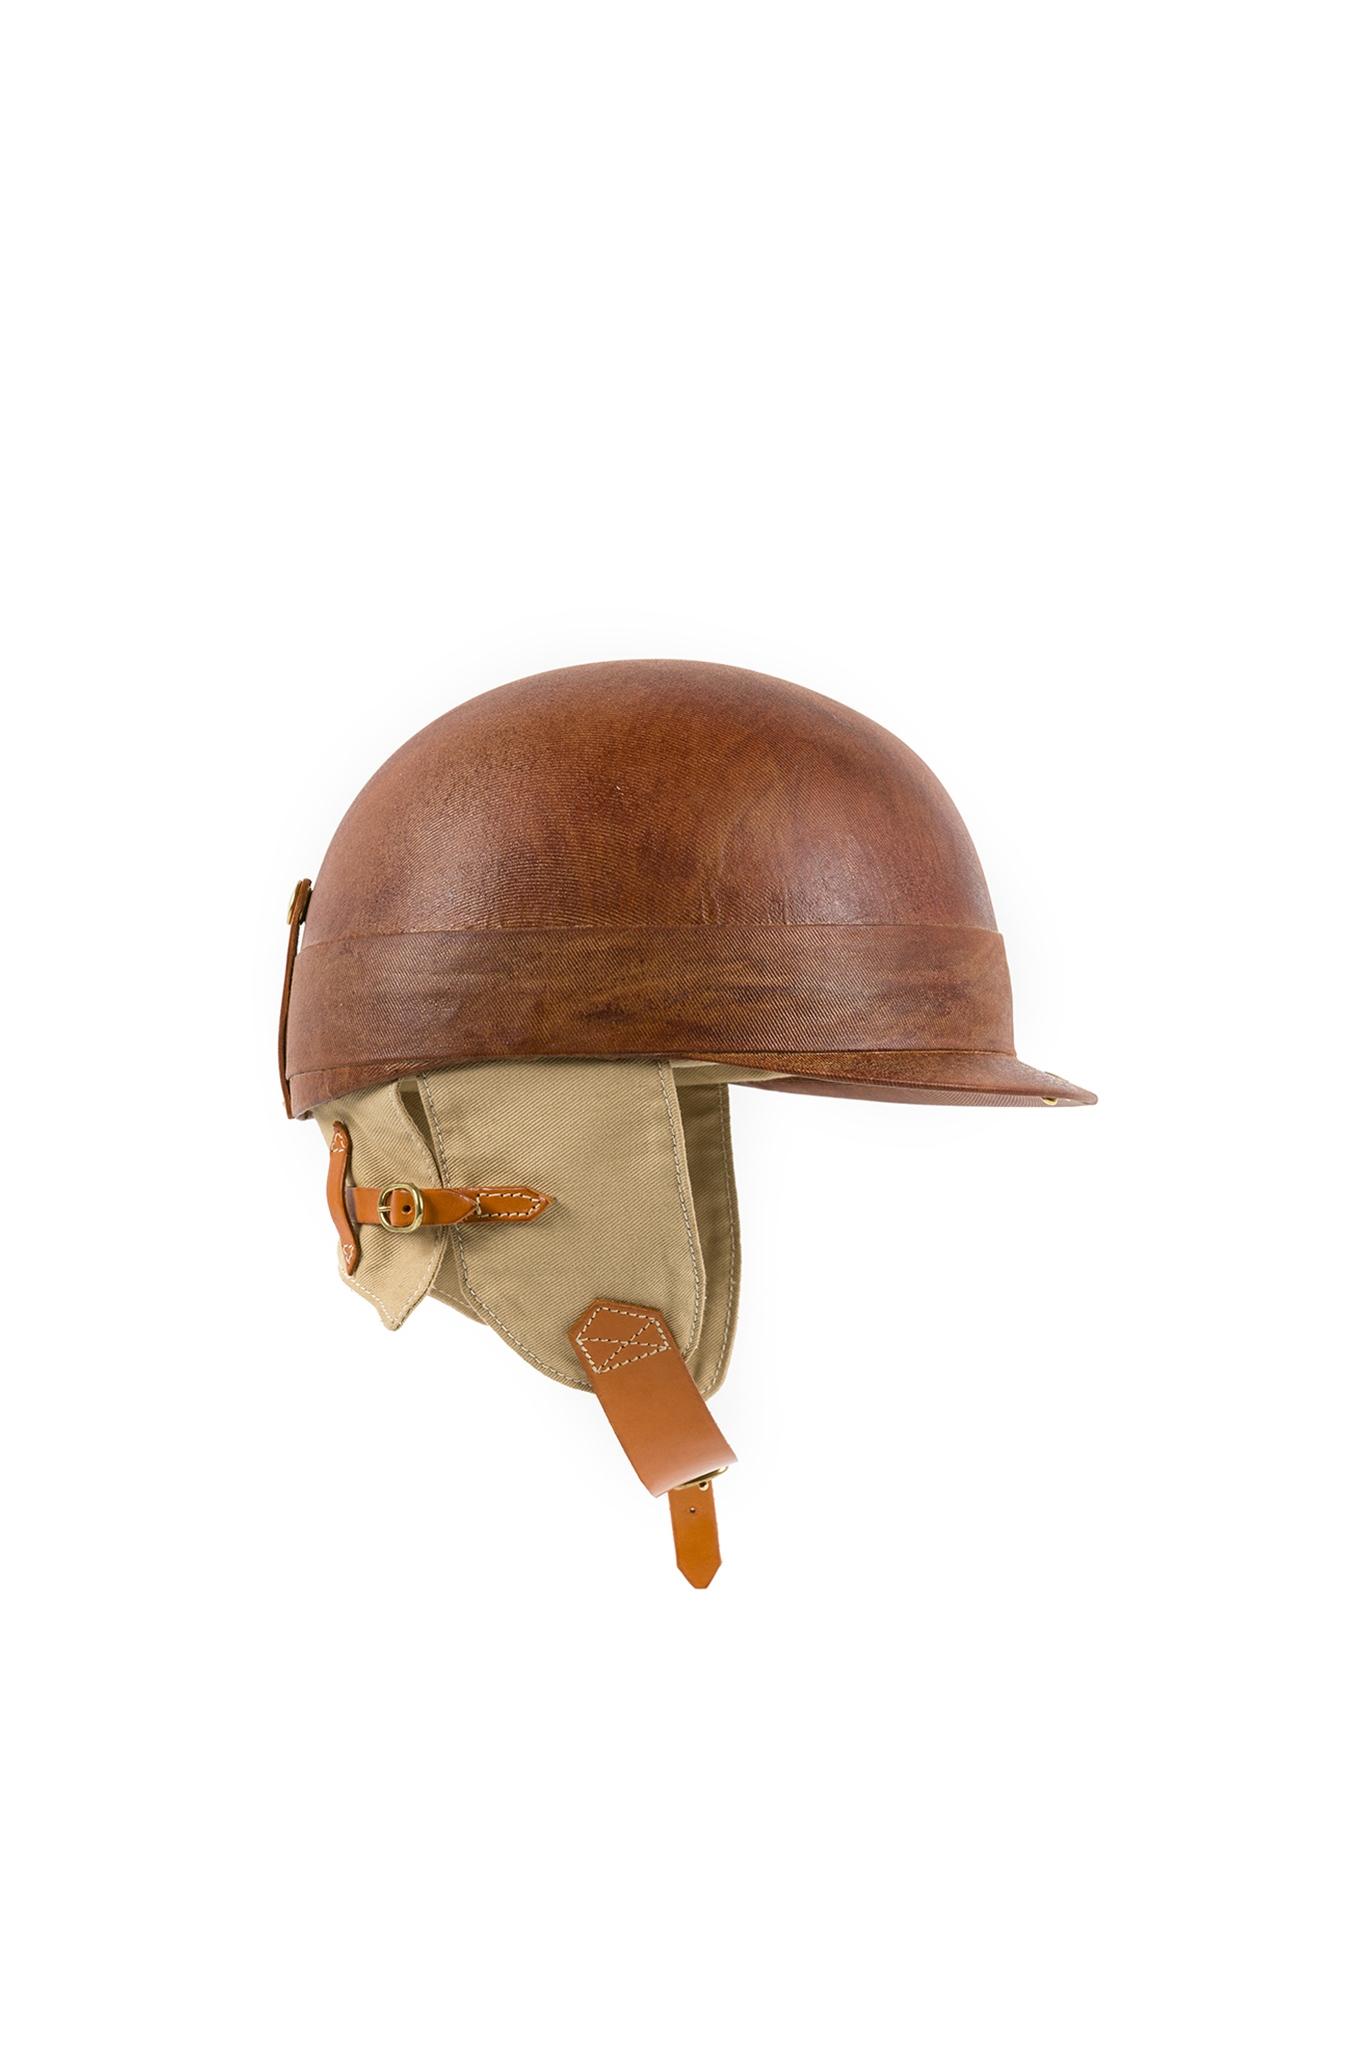 1950 Helmet - Canvas & resin